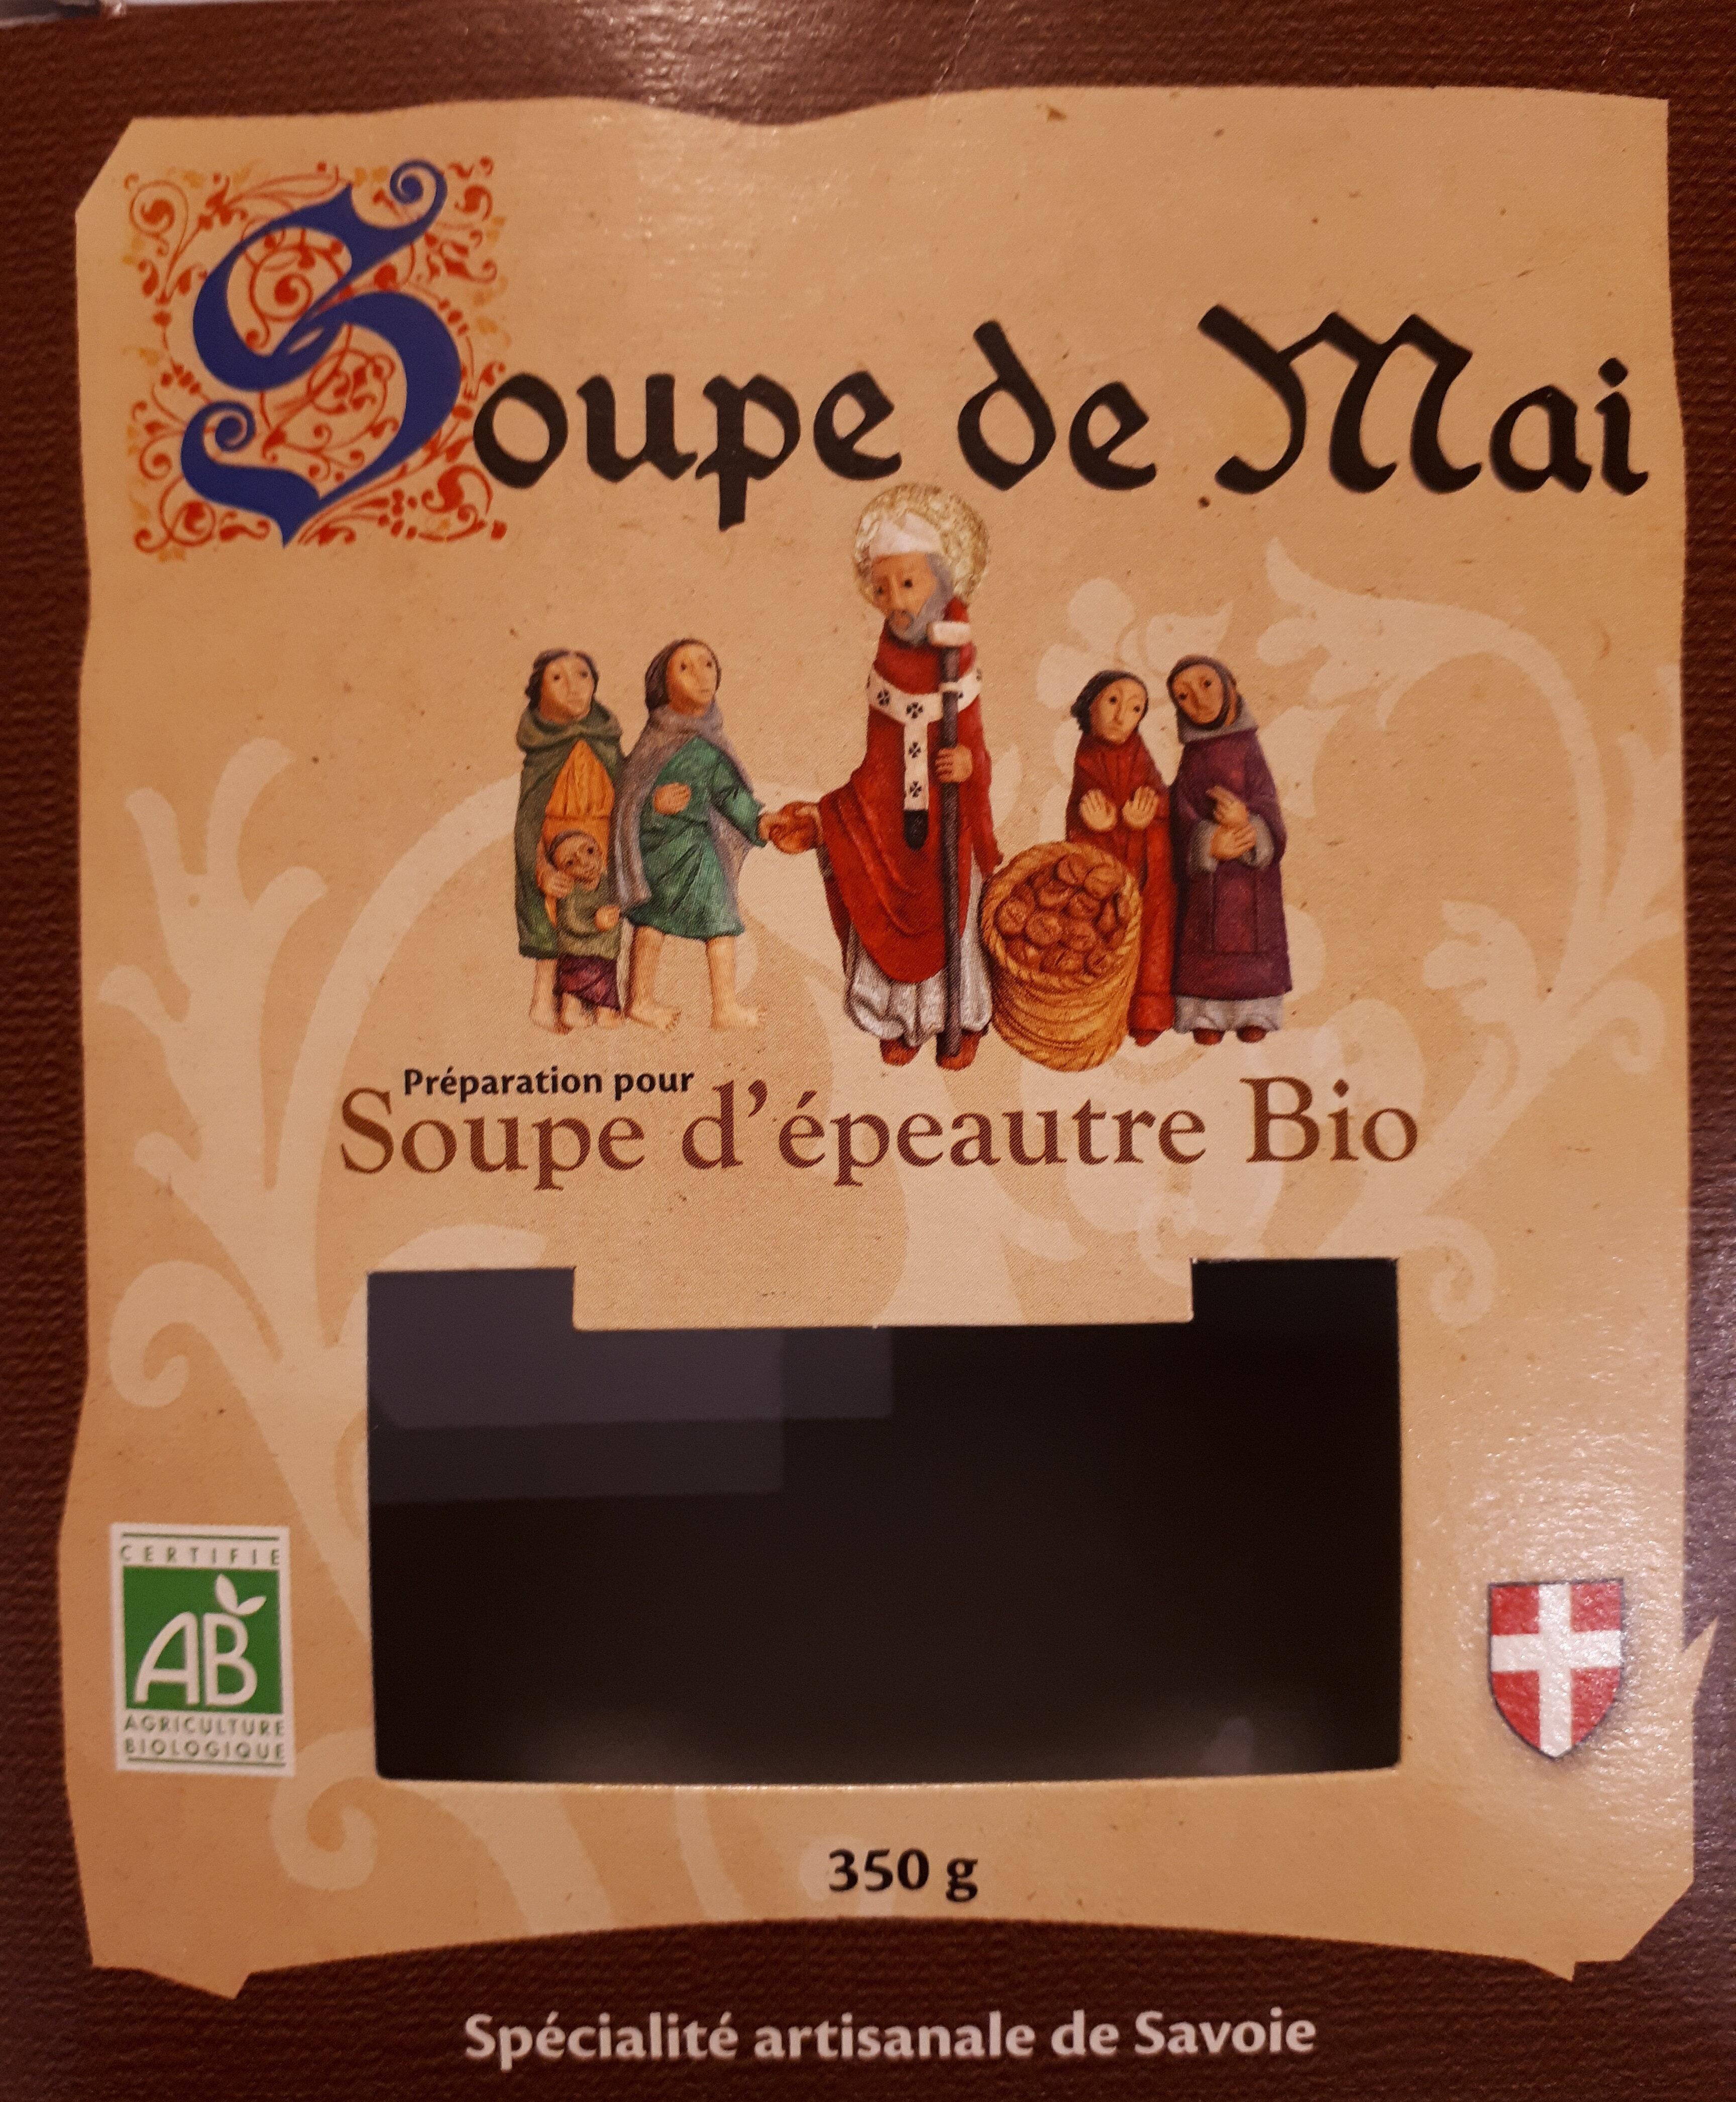 Soupe de mai - Produit - fr